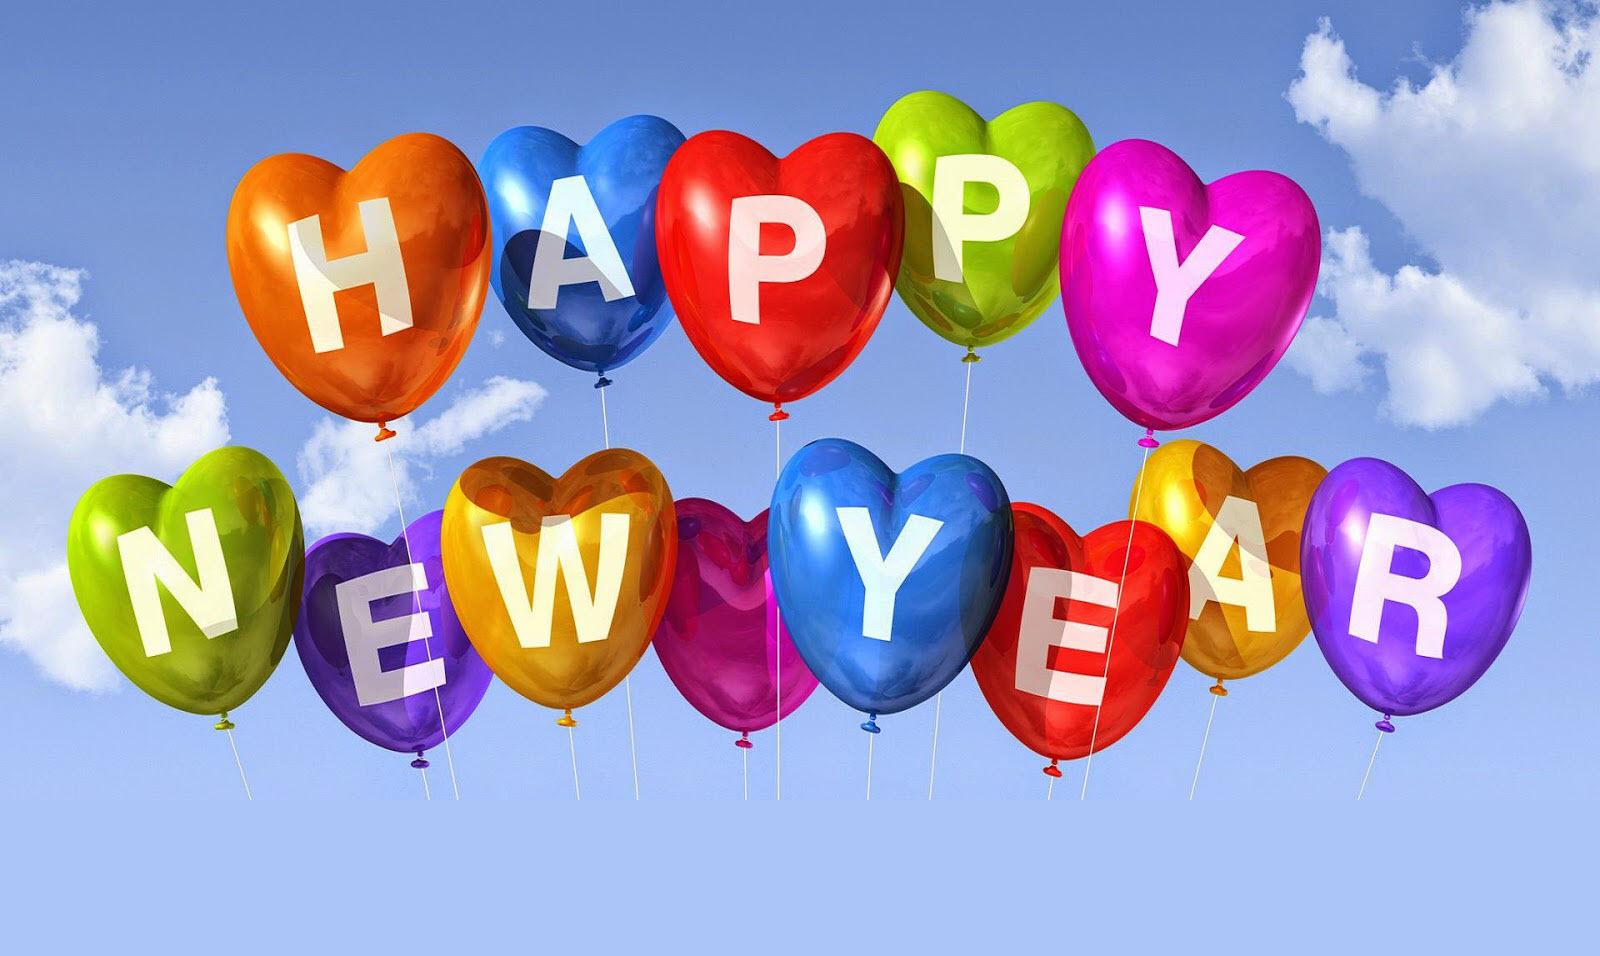 Ảnh Happy New Year đẹp